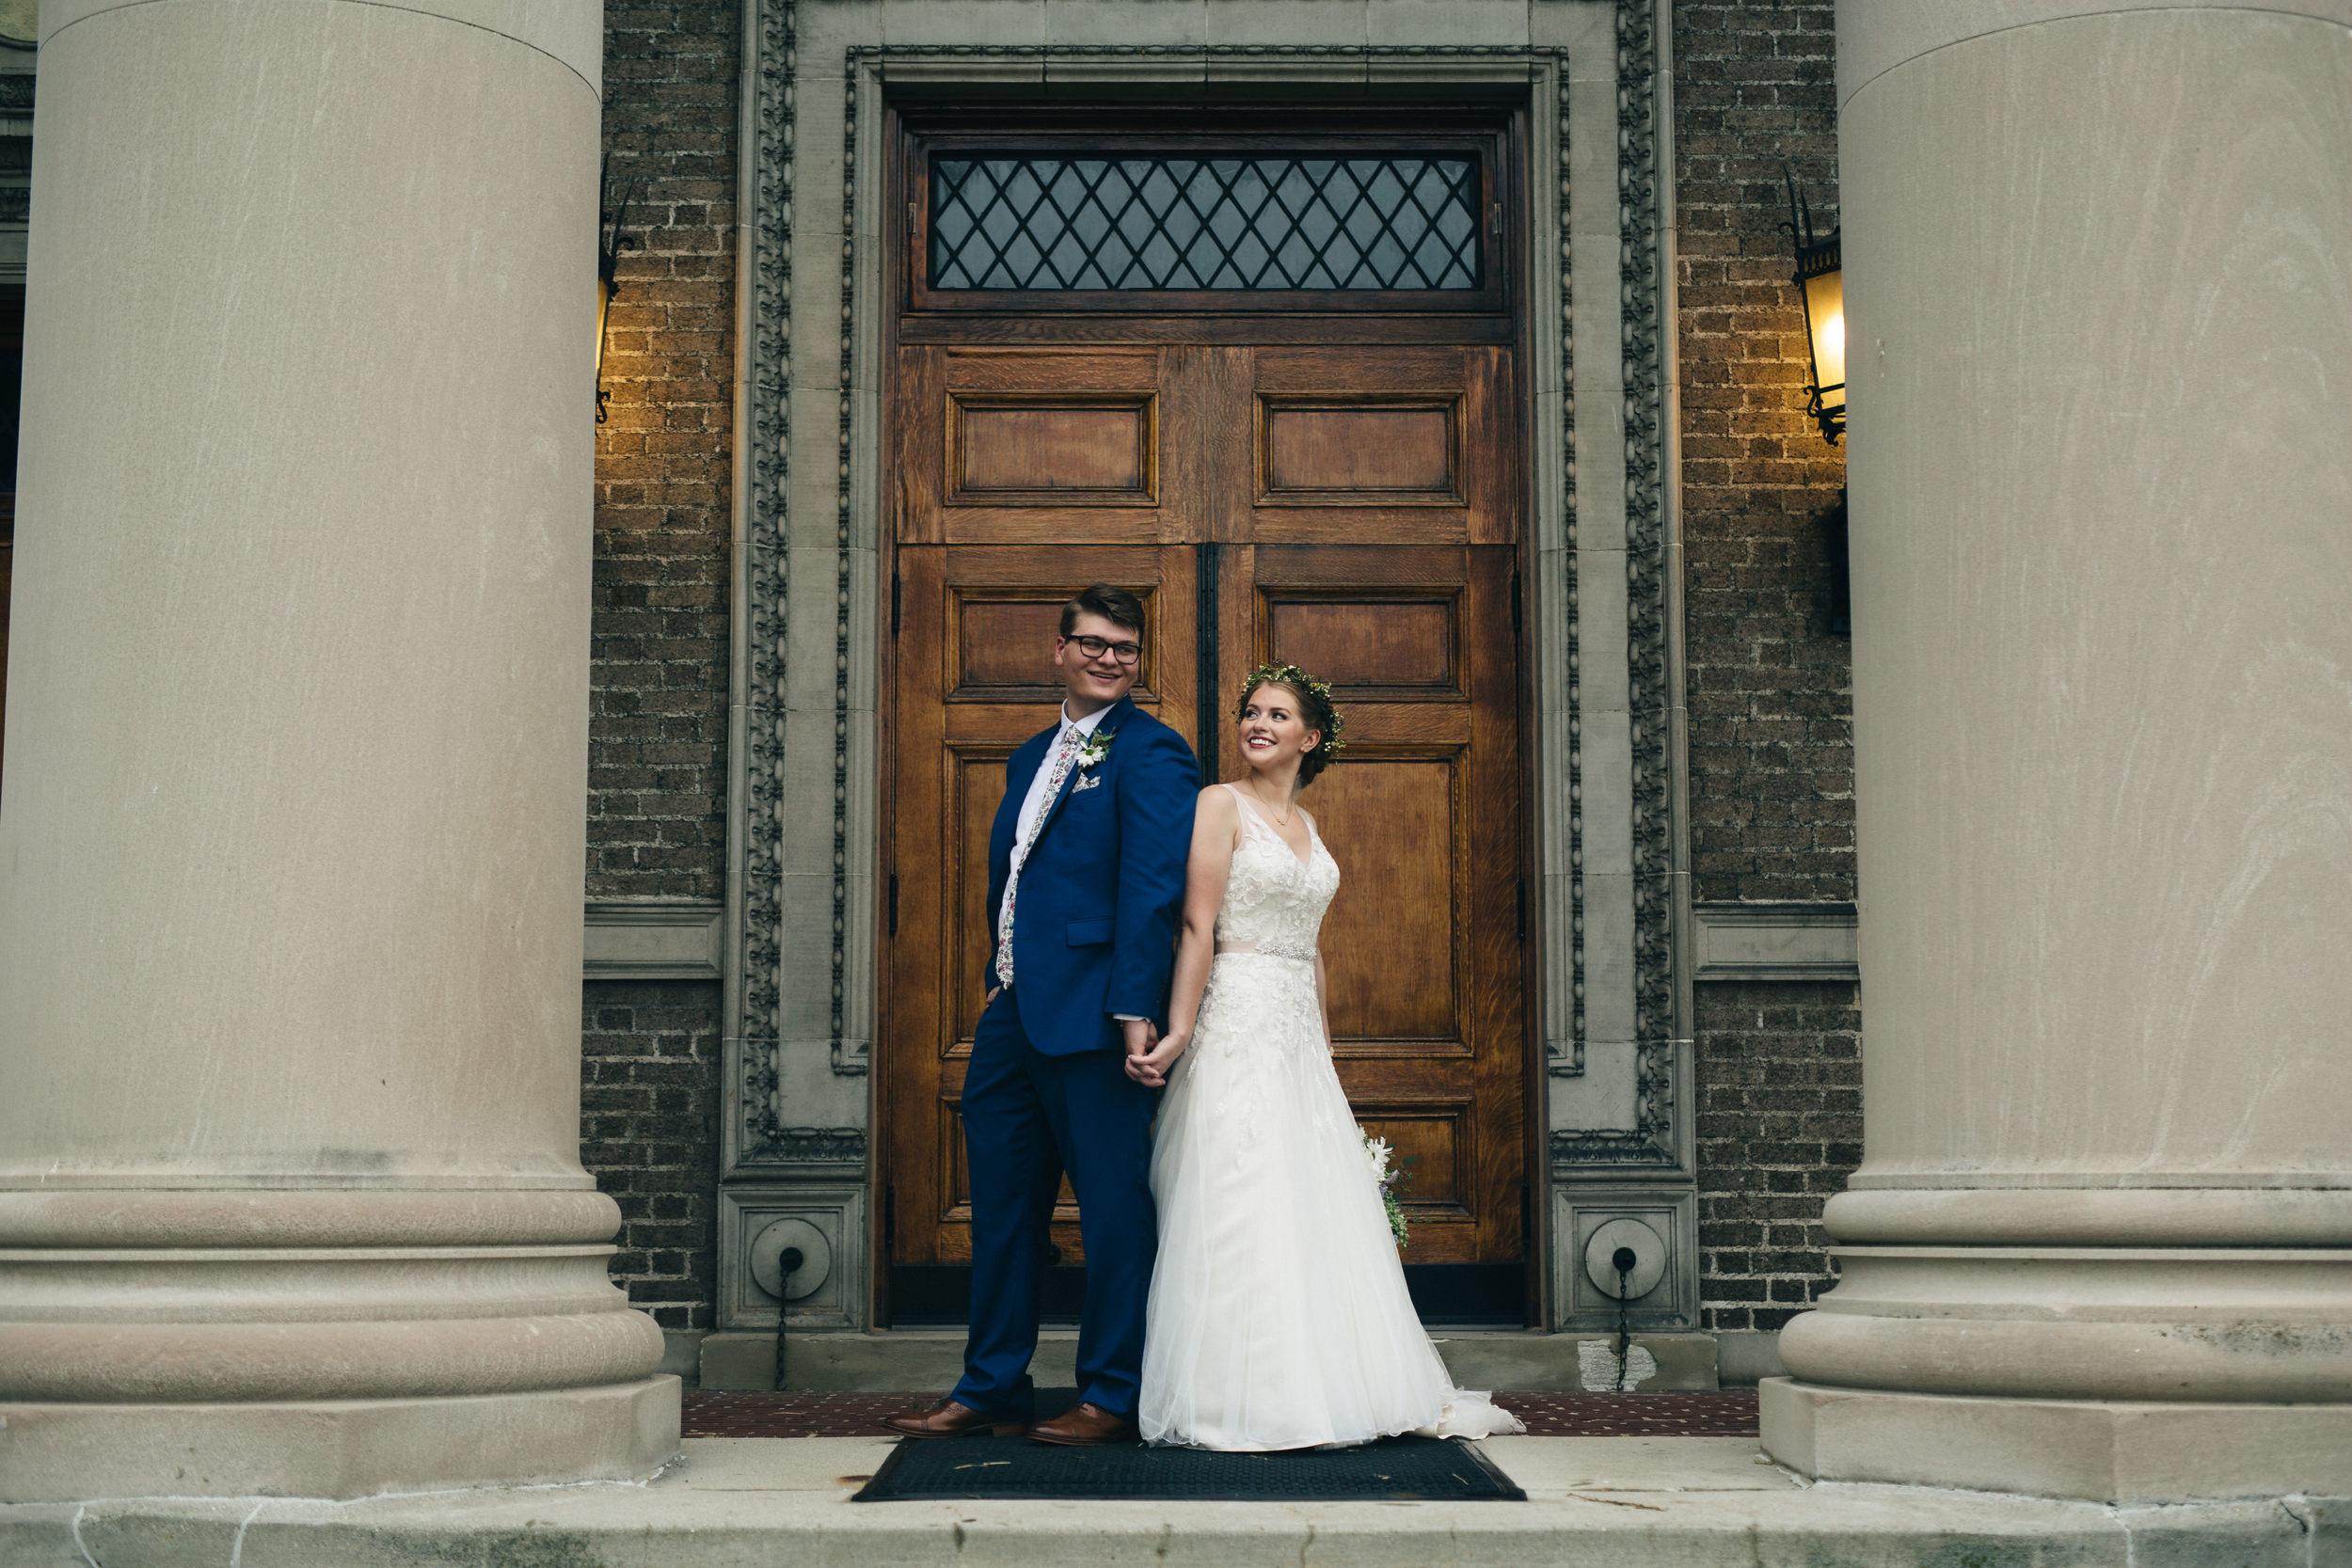 Bride and groom wedding photography.